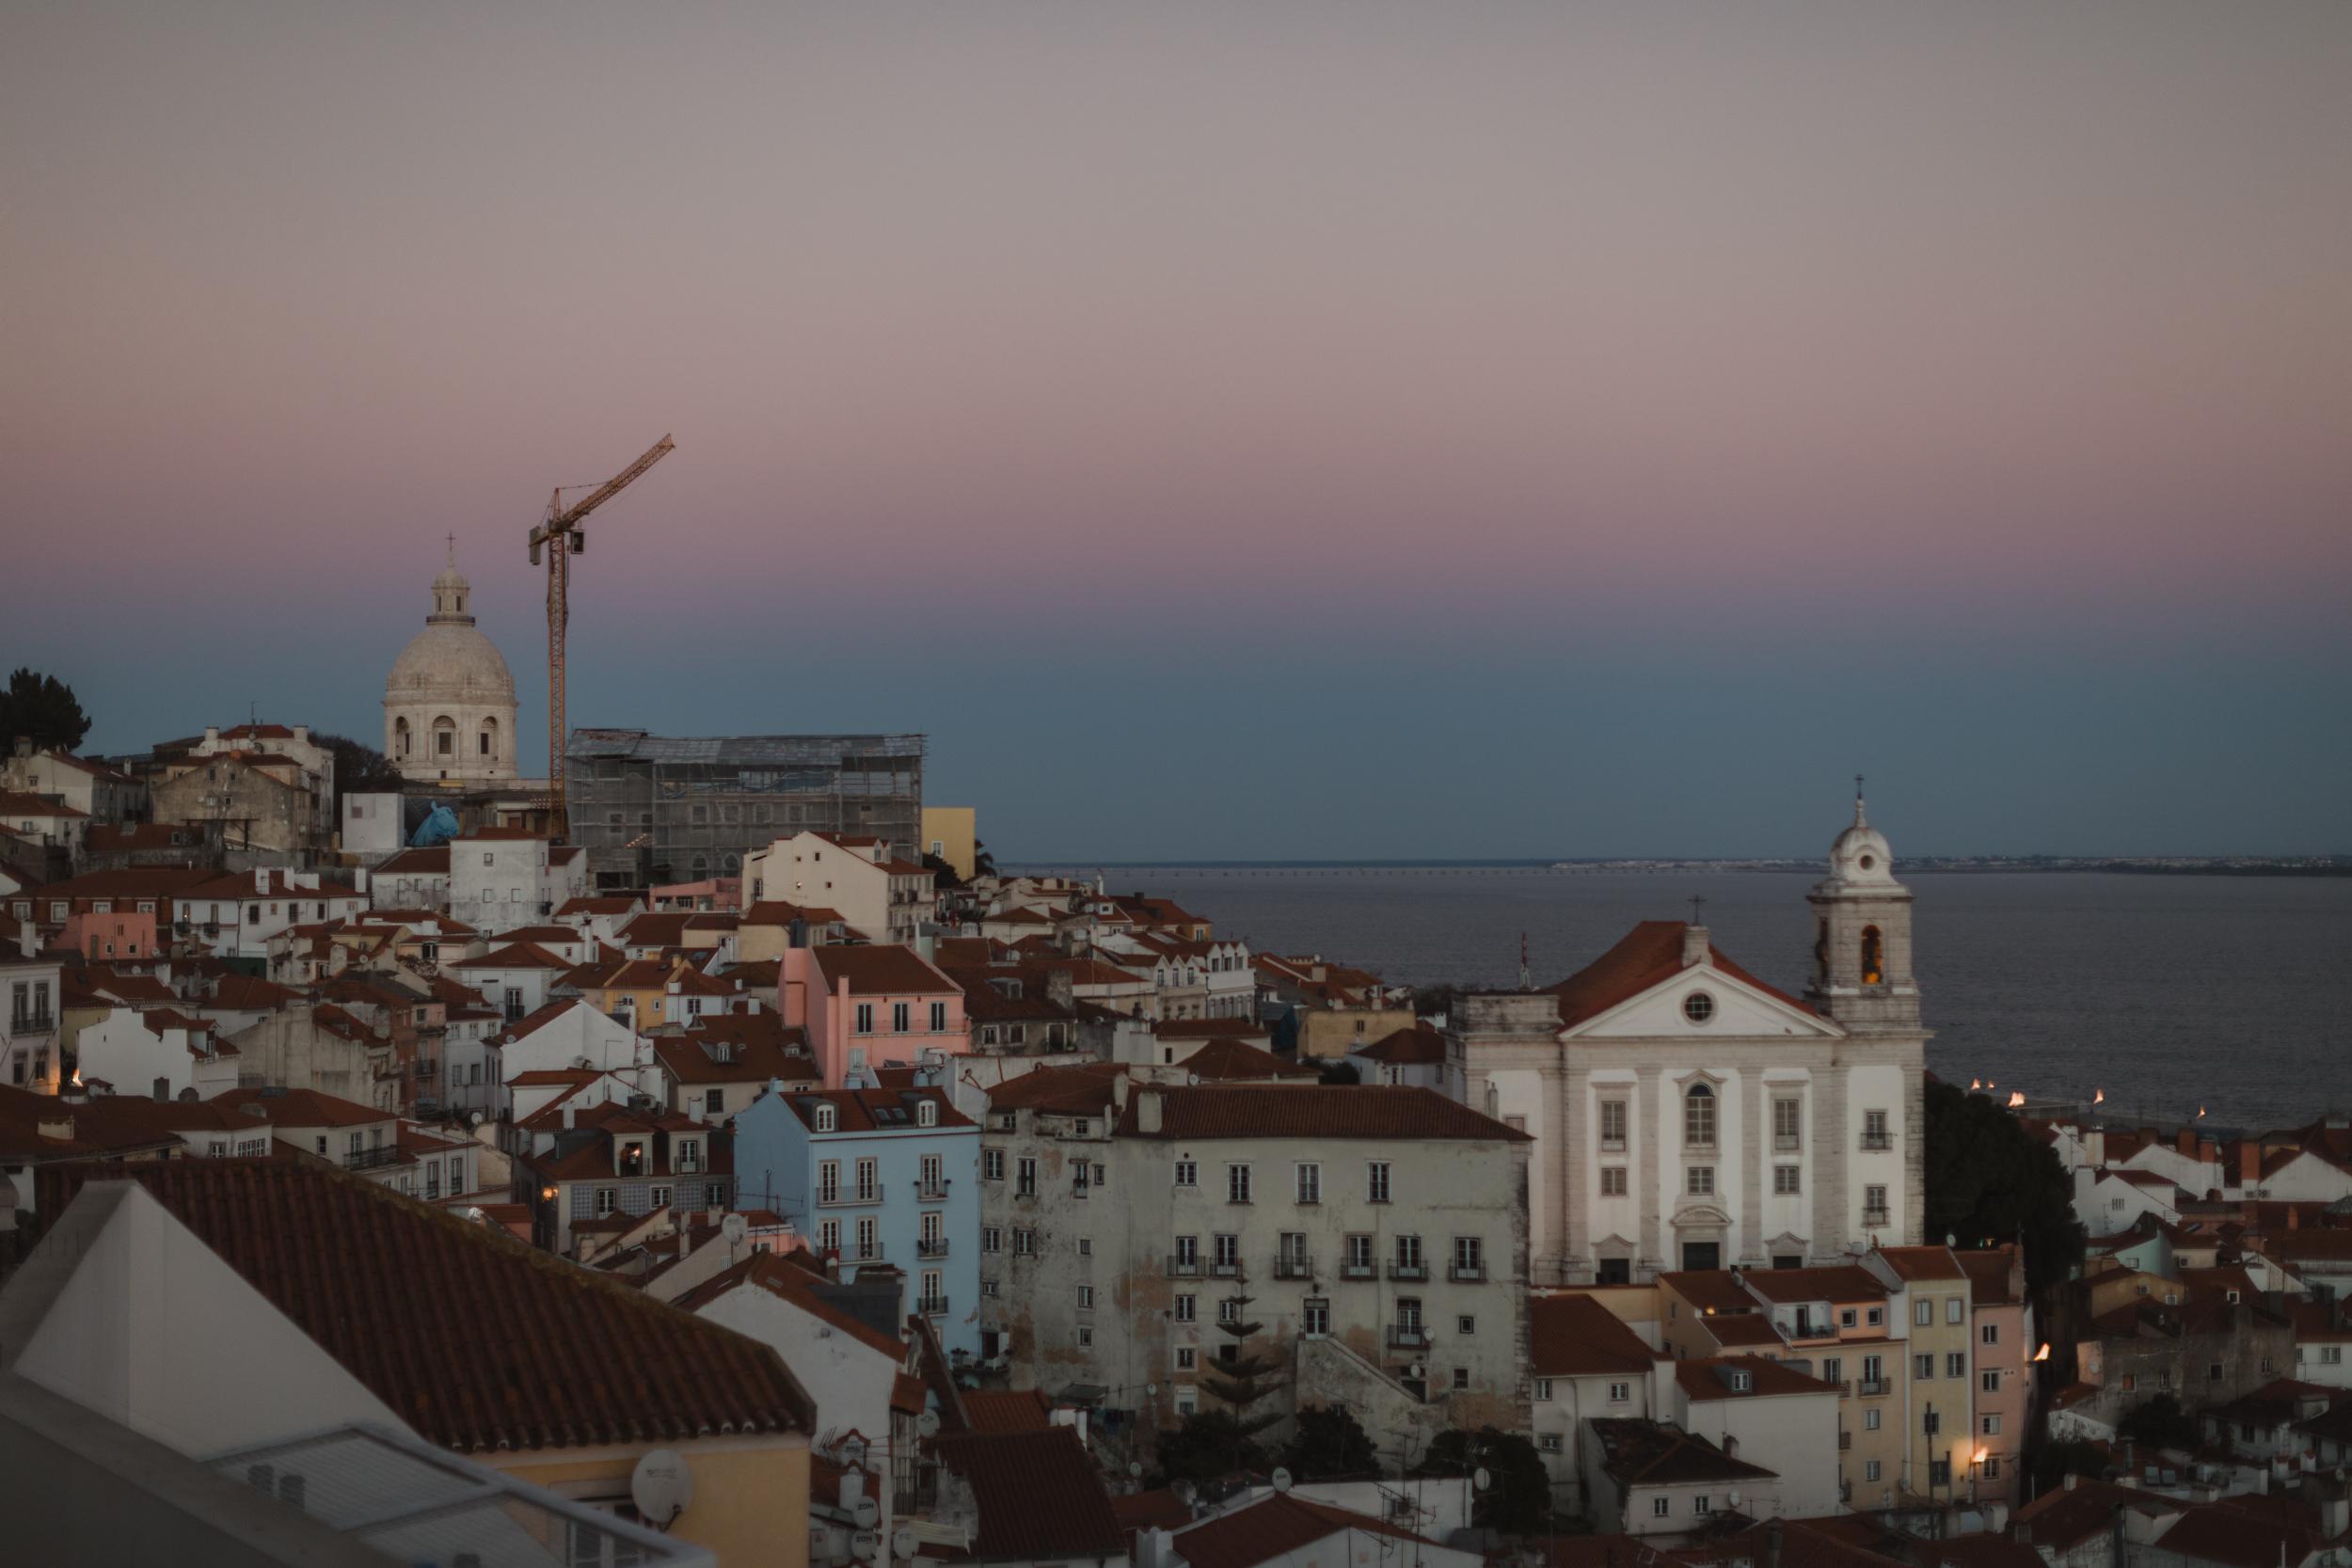 Sunset view from Miradoura de Santa Luzia